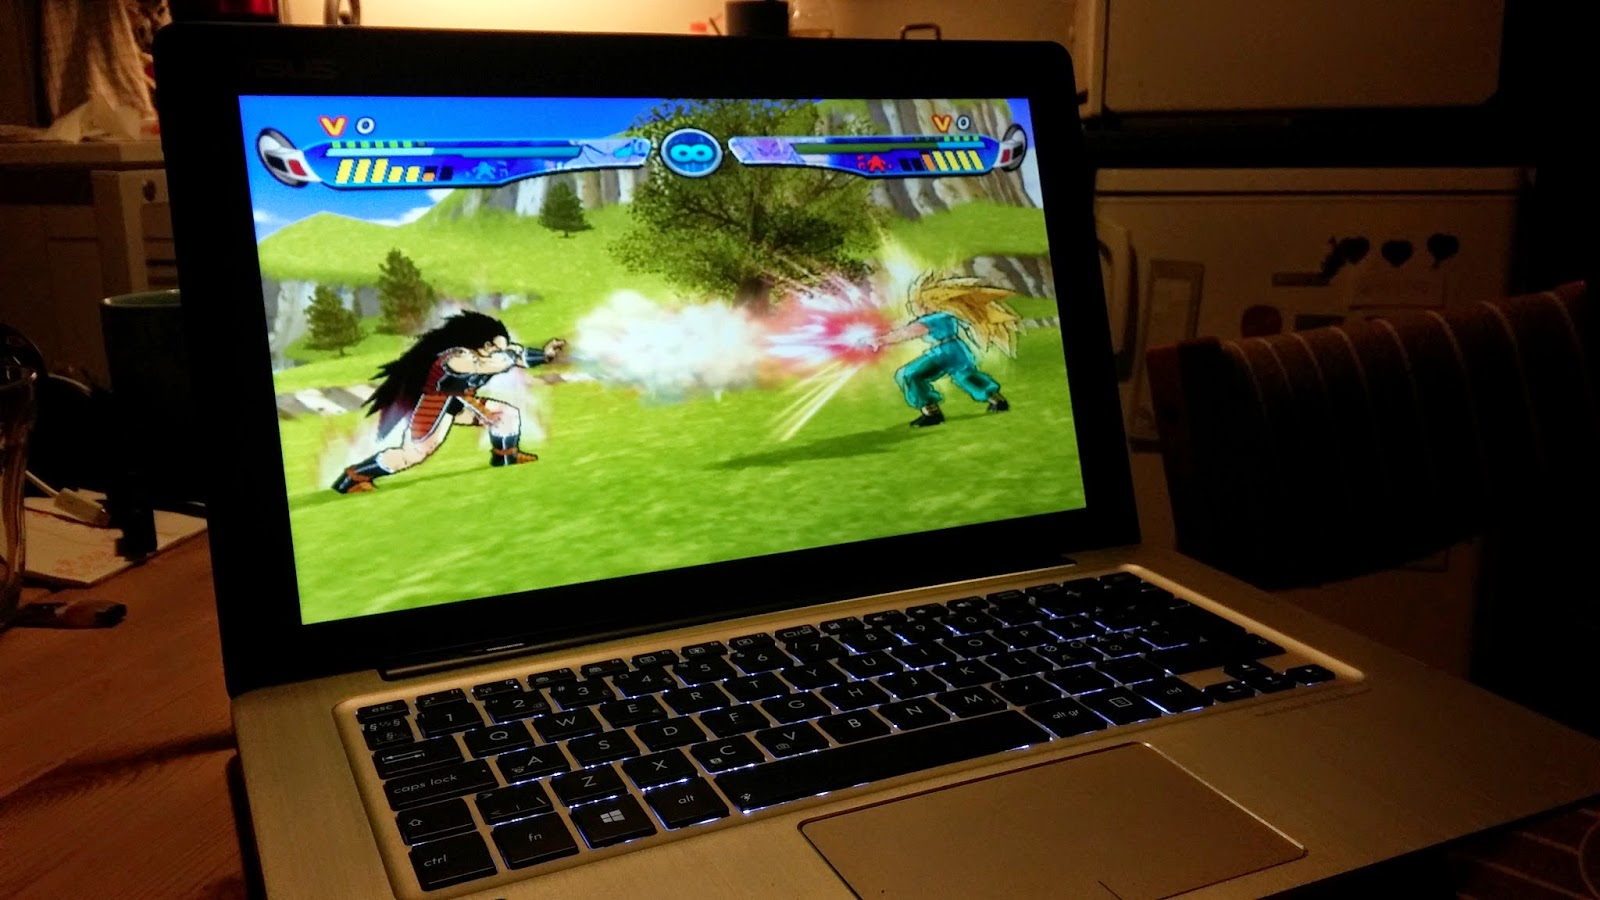 EnatorMods: PCSX2 and game pads